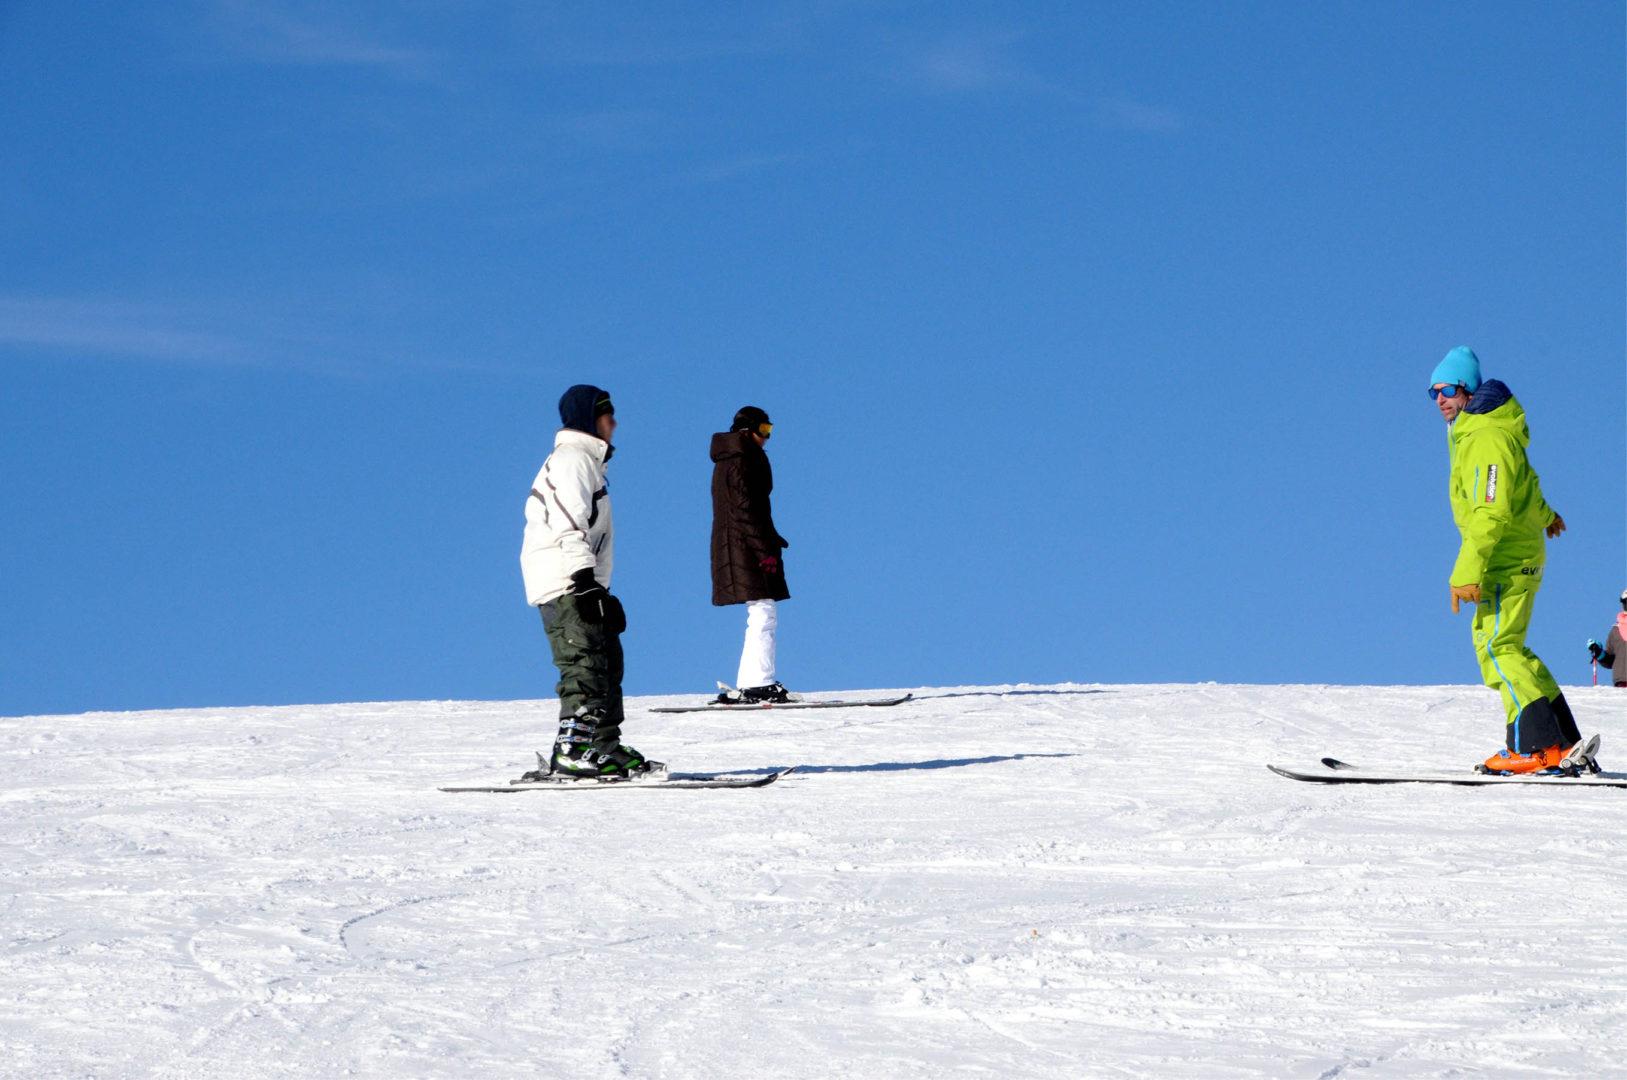 ski instructor vars